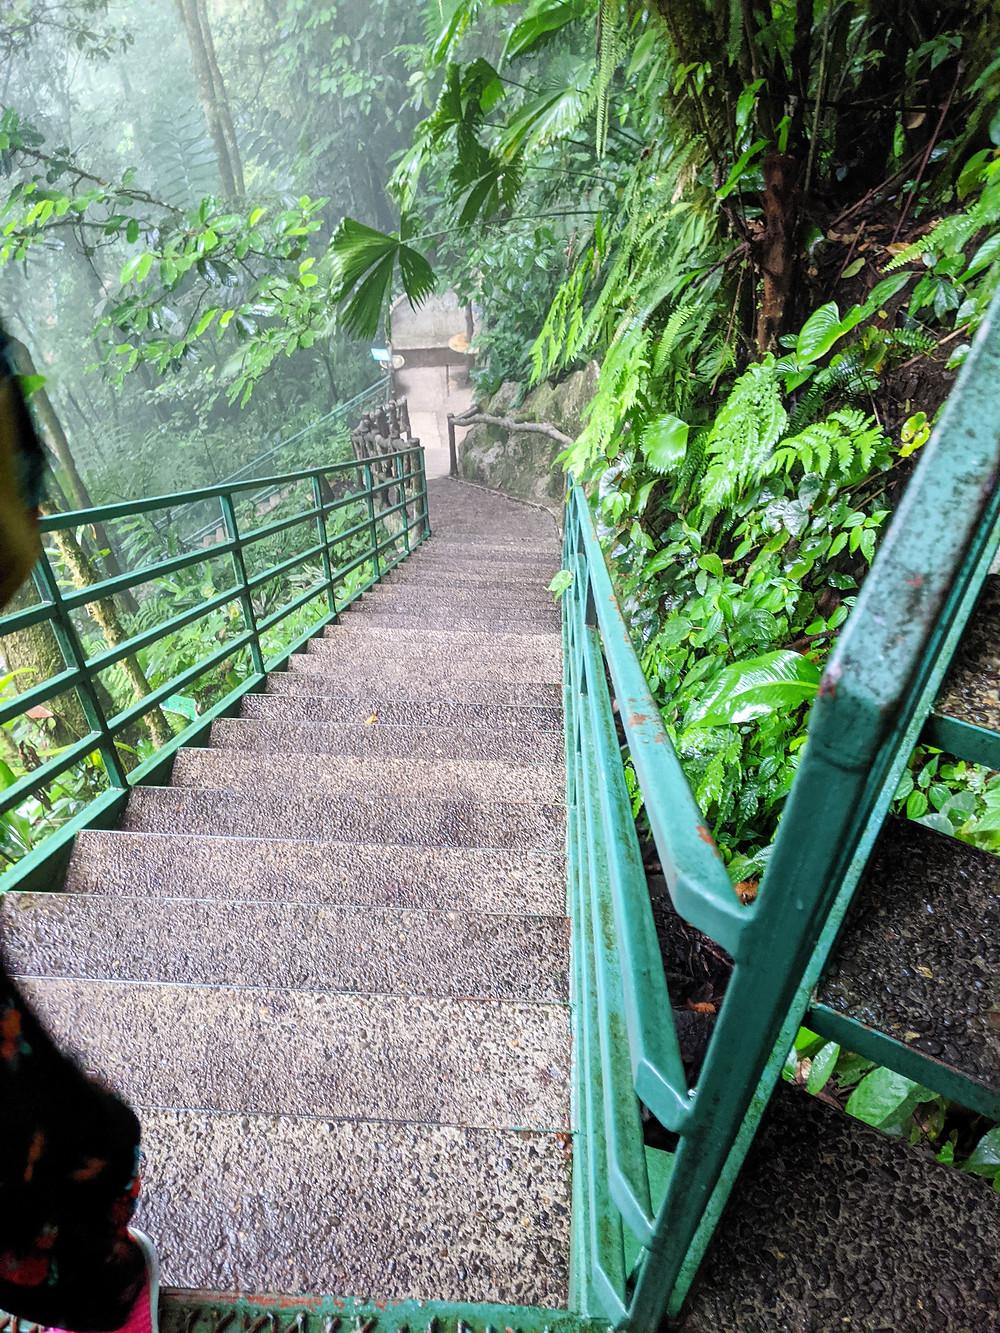 La Fortuna Waterfall Trail of 500 stairs